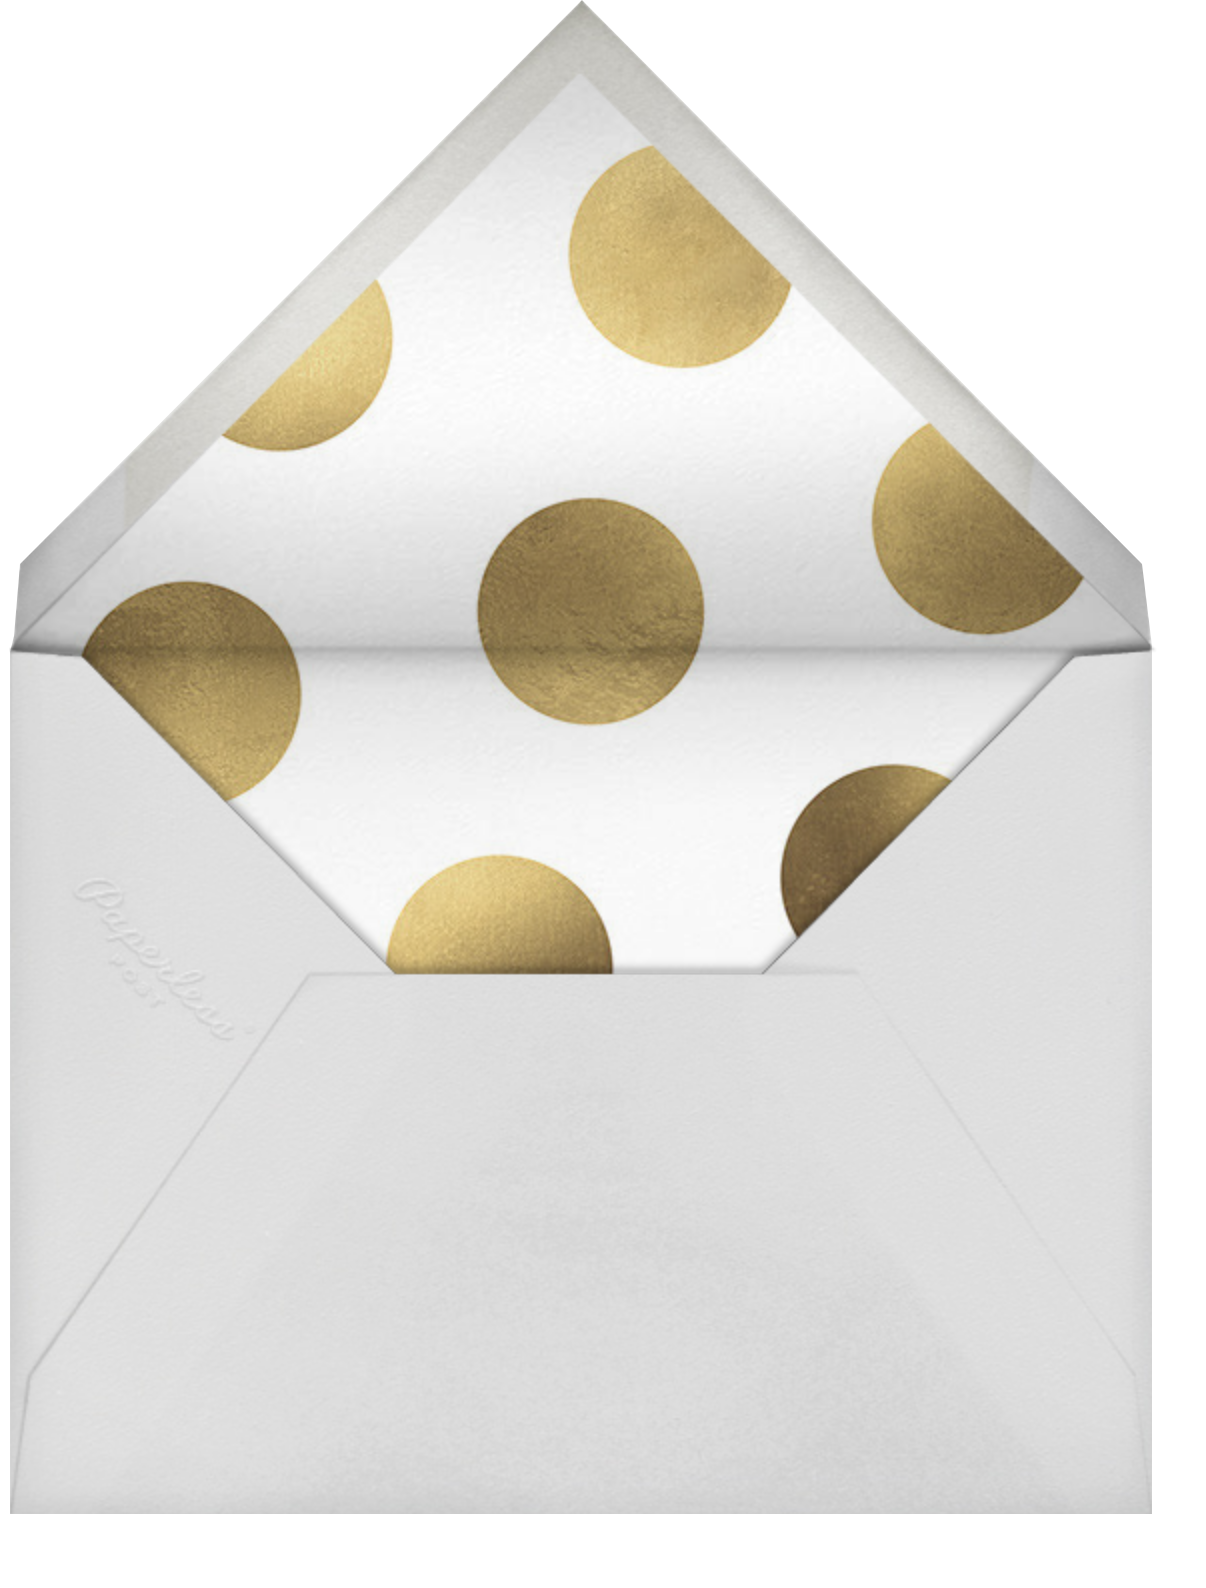 Celebration Dots - Charcoal/Gold - Sugar Paper - Graduation party - envelope back